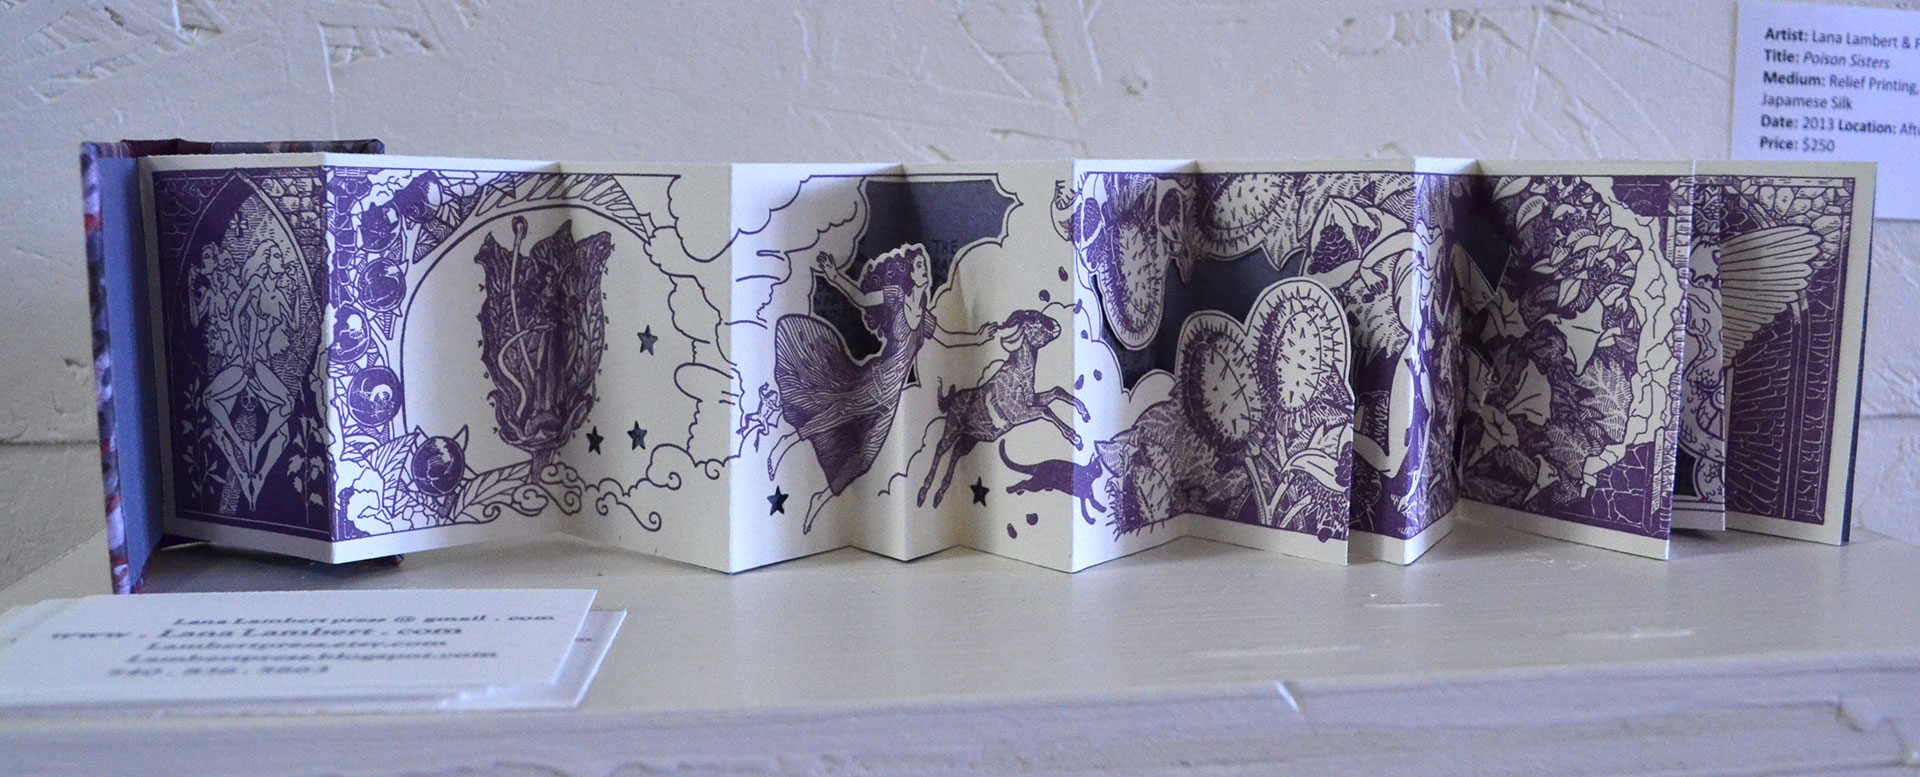 Lana Lambert & Frank Ricco Poison Sisters, Relief Printing, Italian Marble Paper, Japanese Silk, 2013, $250